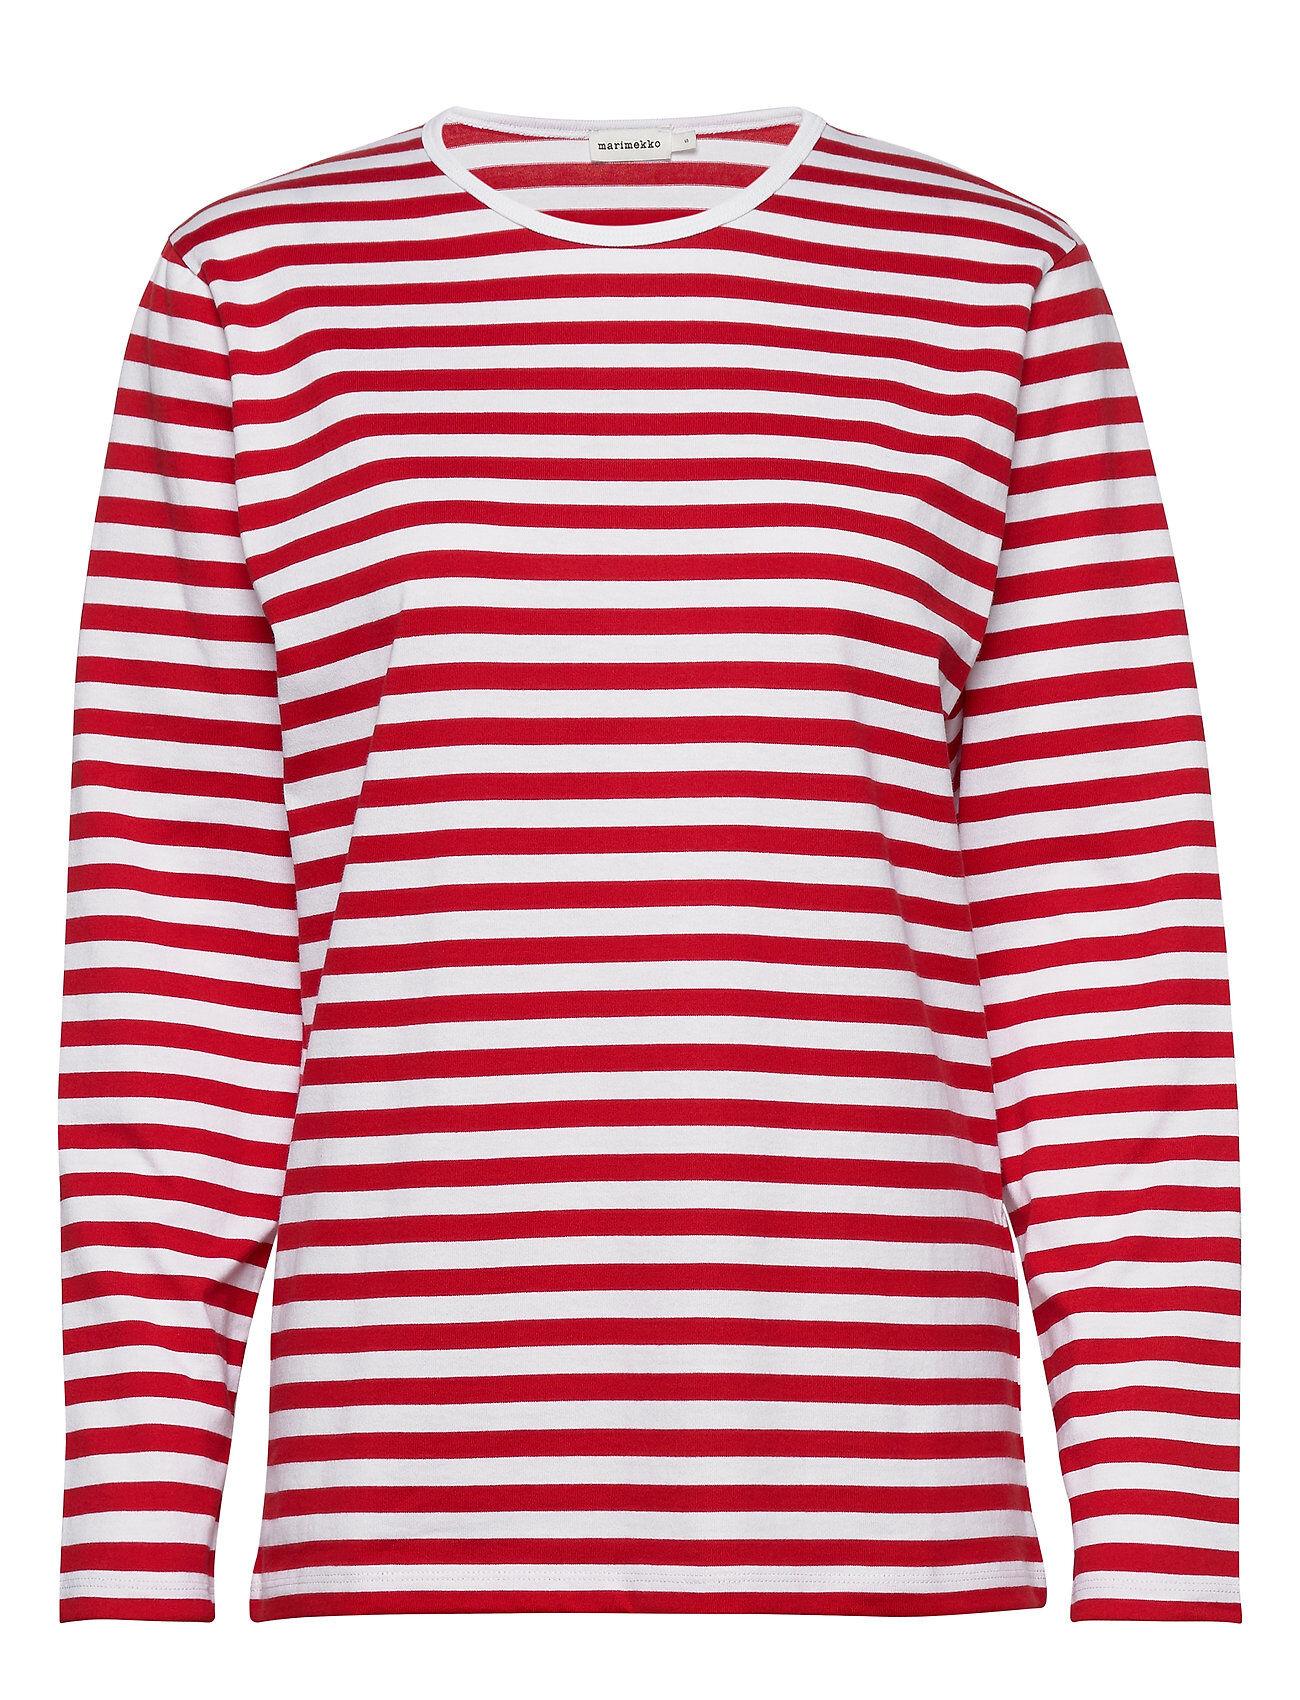 Marimekko PitkÄHiha 2017 Shirt T-shirts & Tops Long-sleeved Punainen Marimekko